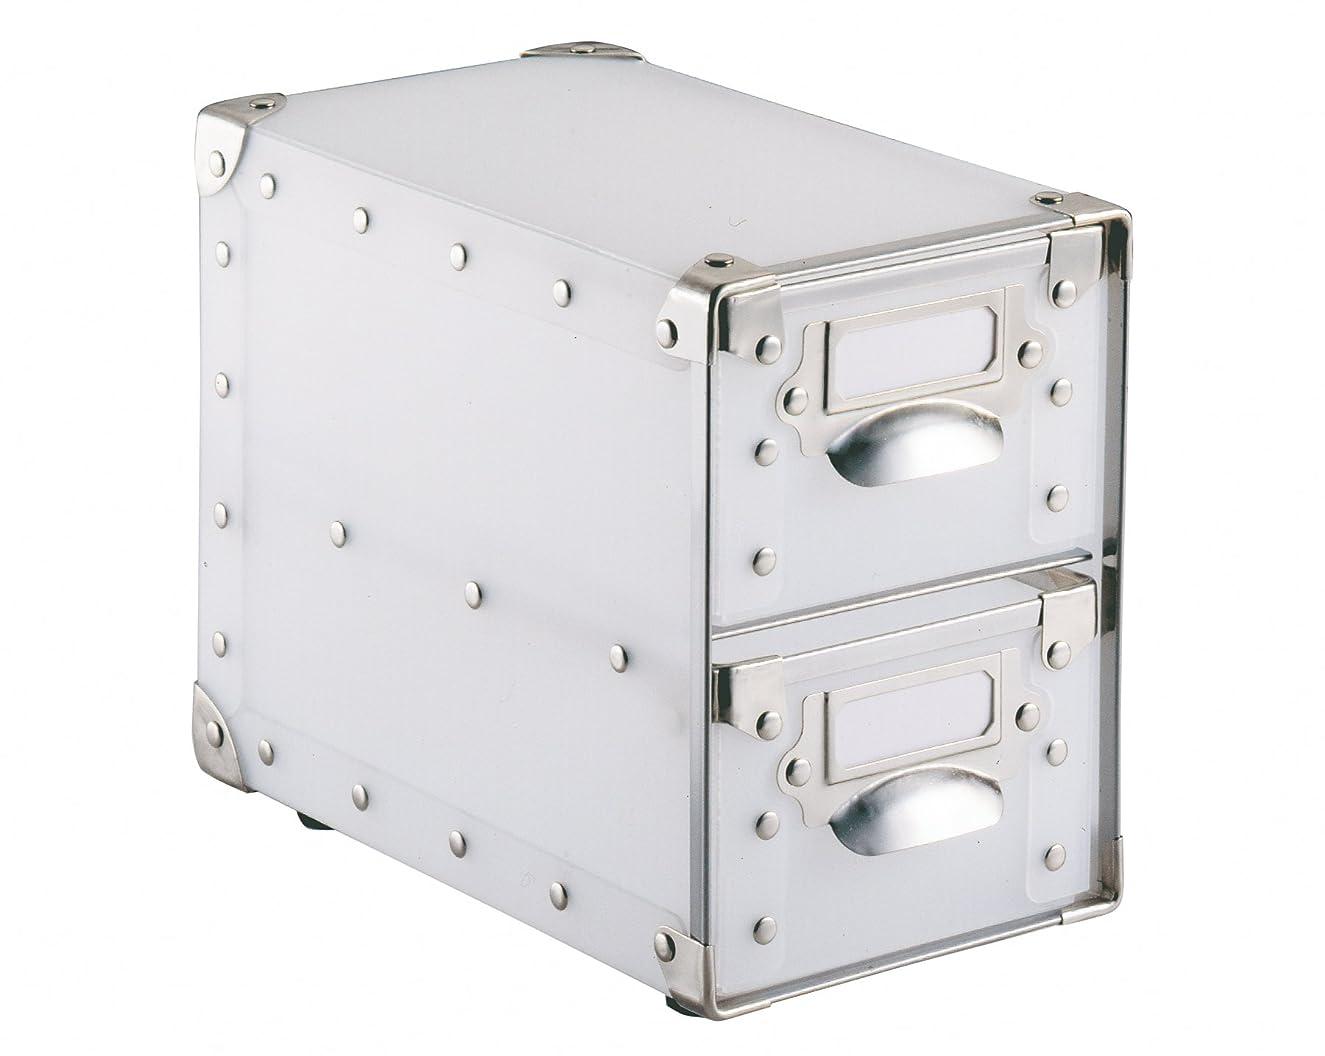 Organize It All Translucent 2 Drawer Small Storage Organizer